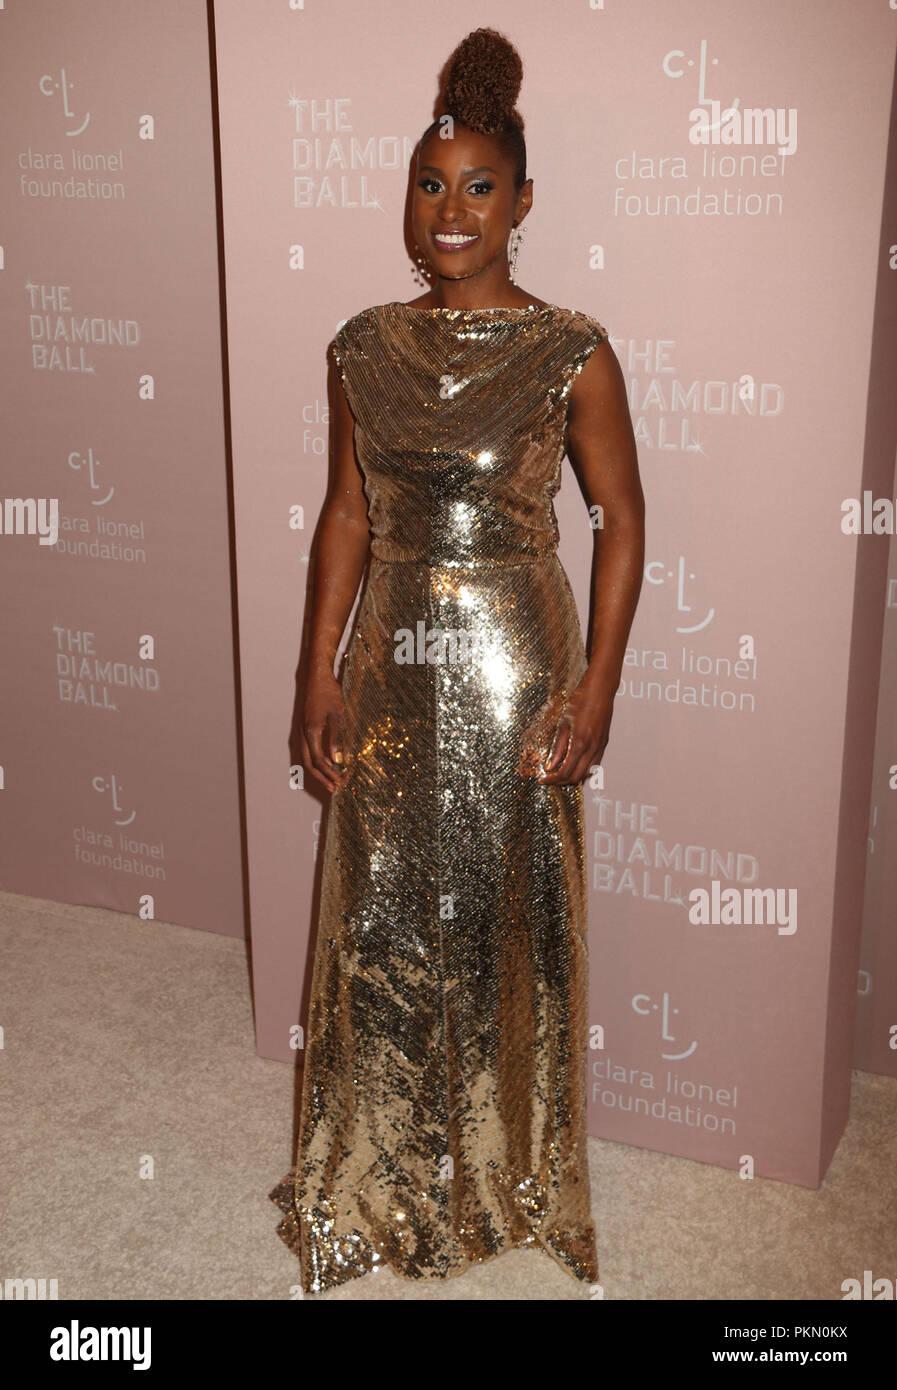 230b25d2721 September 13, 2018 - New York City, New York, U.S. - Producer ISSA RAE  attends Rihanna's 4th Annual Diamond Ball held at Cipriani Wall Street.